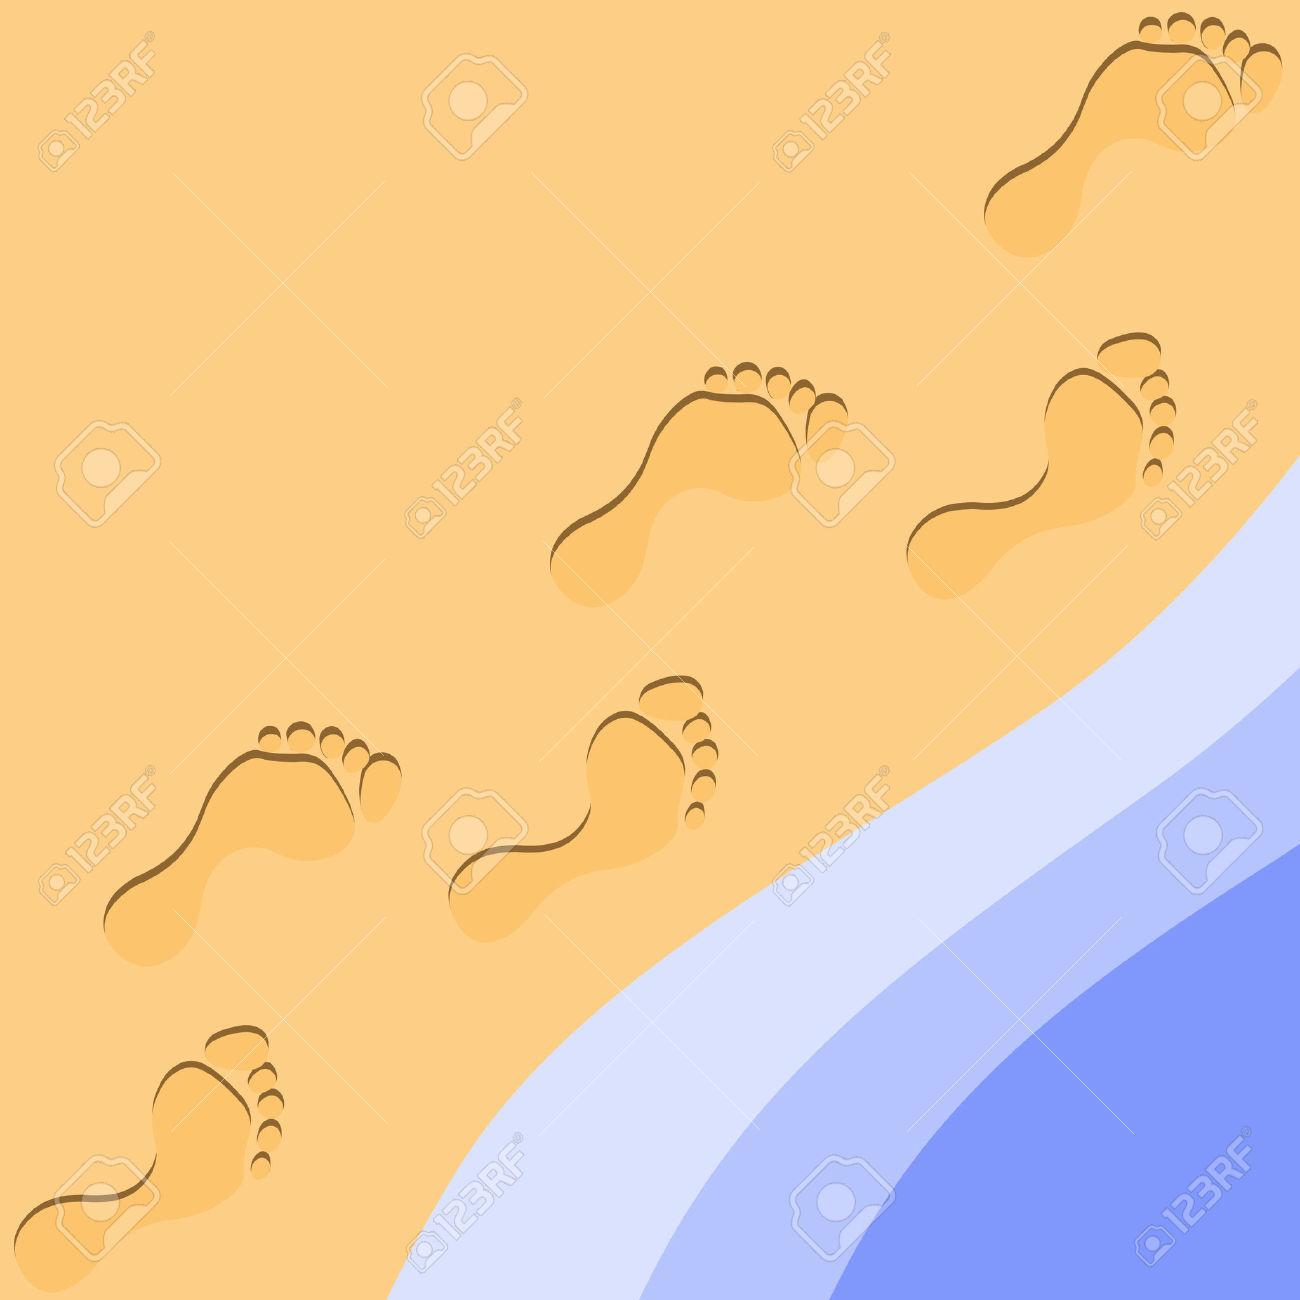 Sand clipart footprint #6